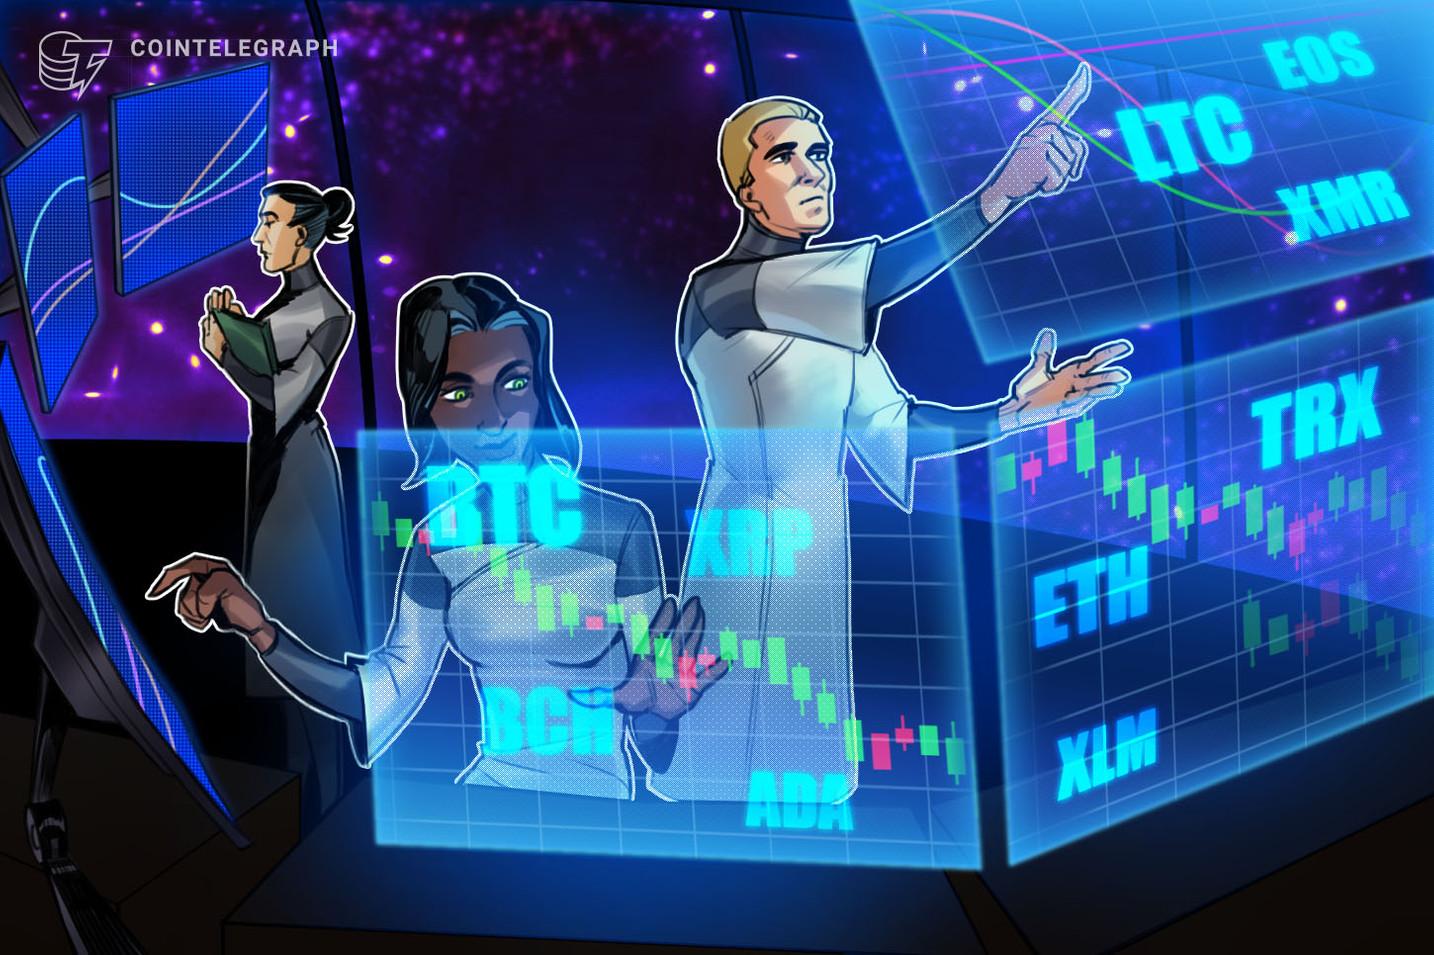 Kursanalyse, 12. November: Bitcoin, Ethereum, Ripple, Bitcoin Cash, EOS, Stellar, Litecoin, Cardano, Monero, TRON